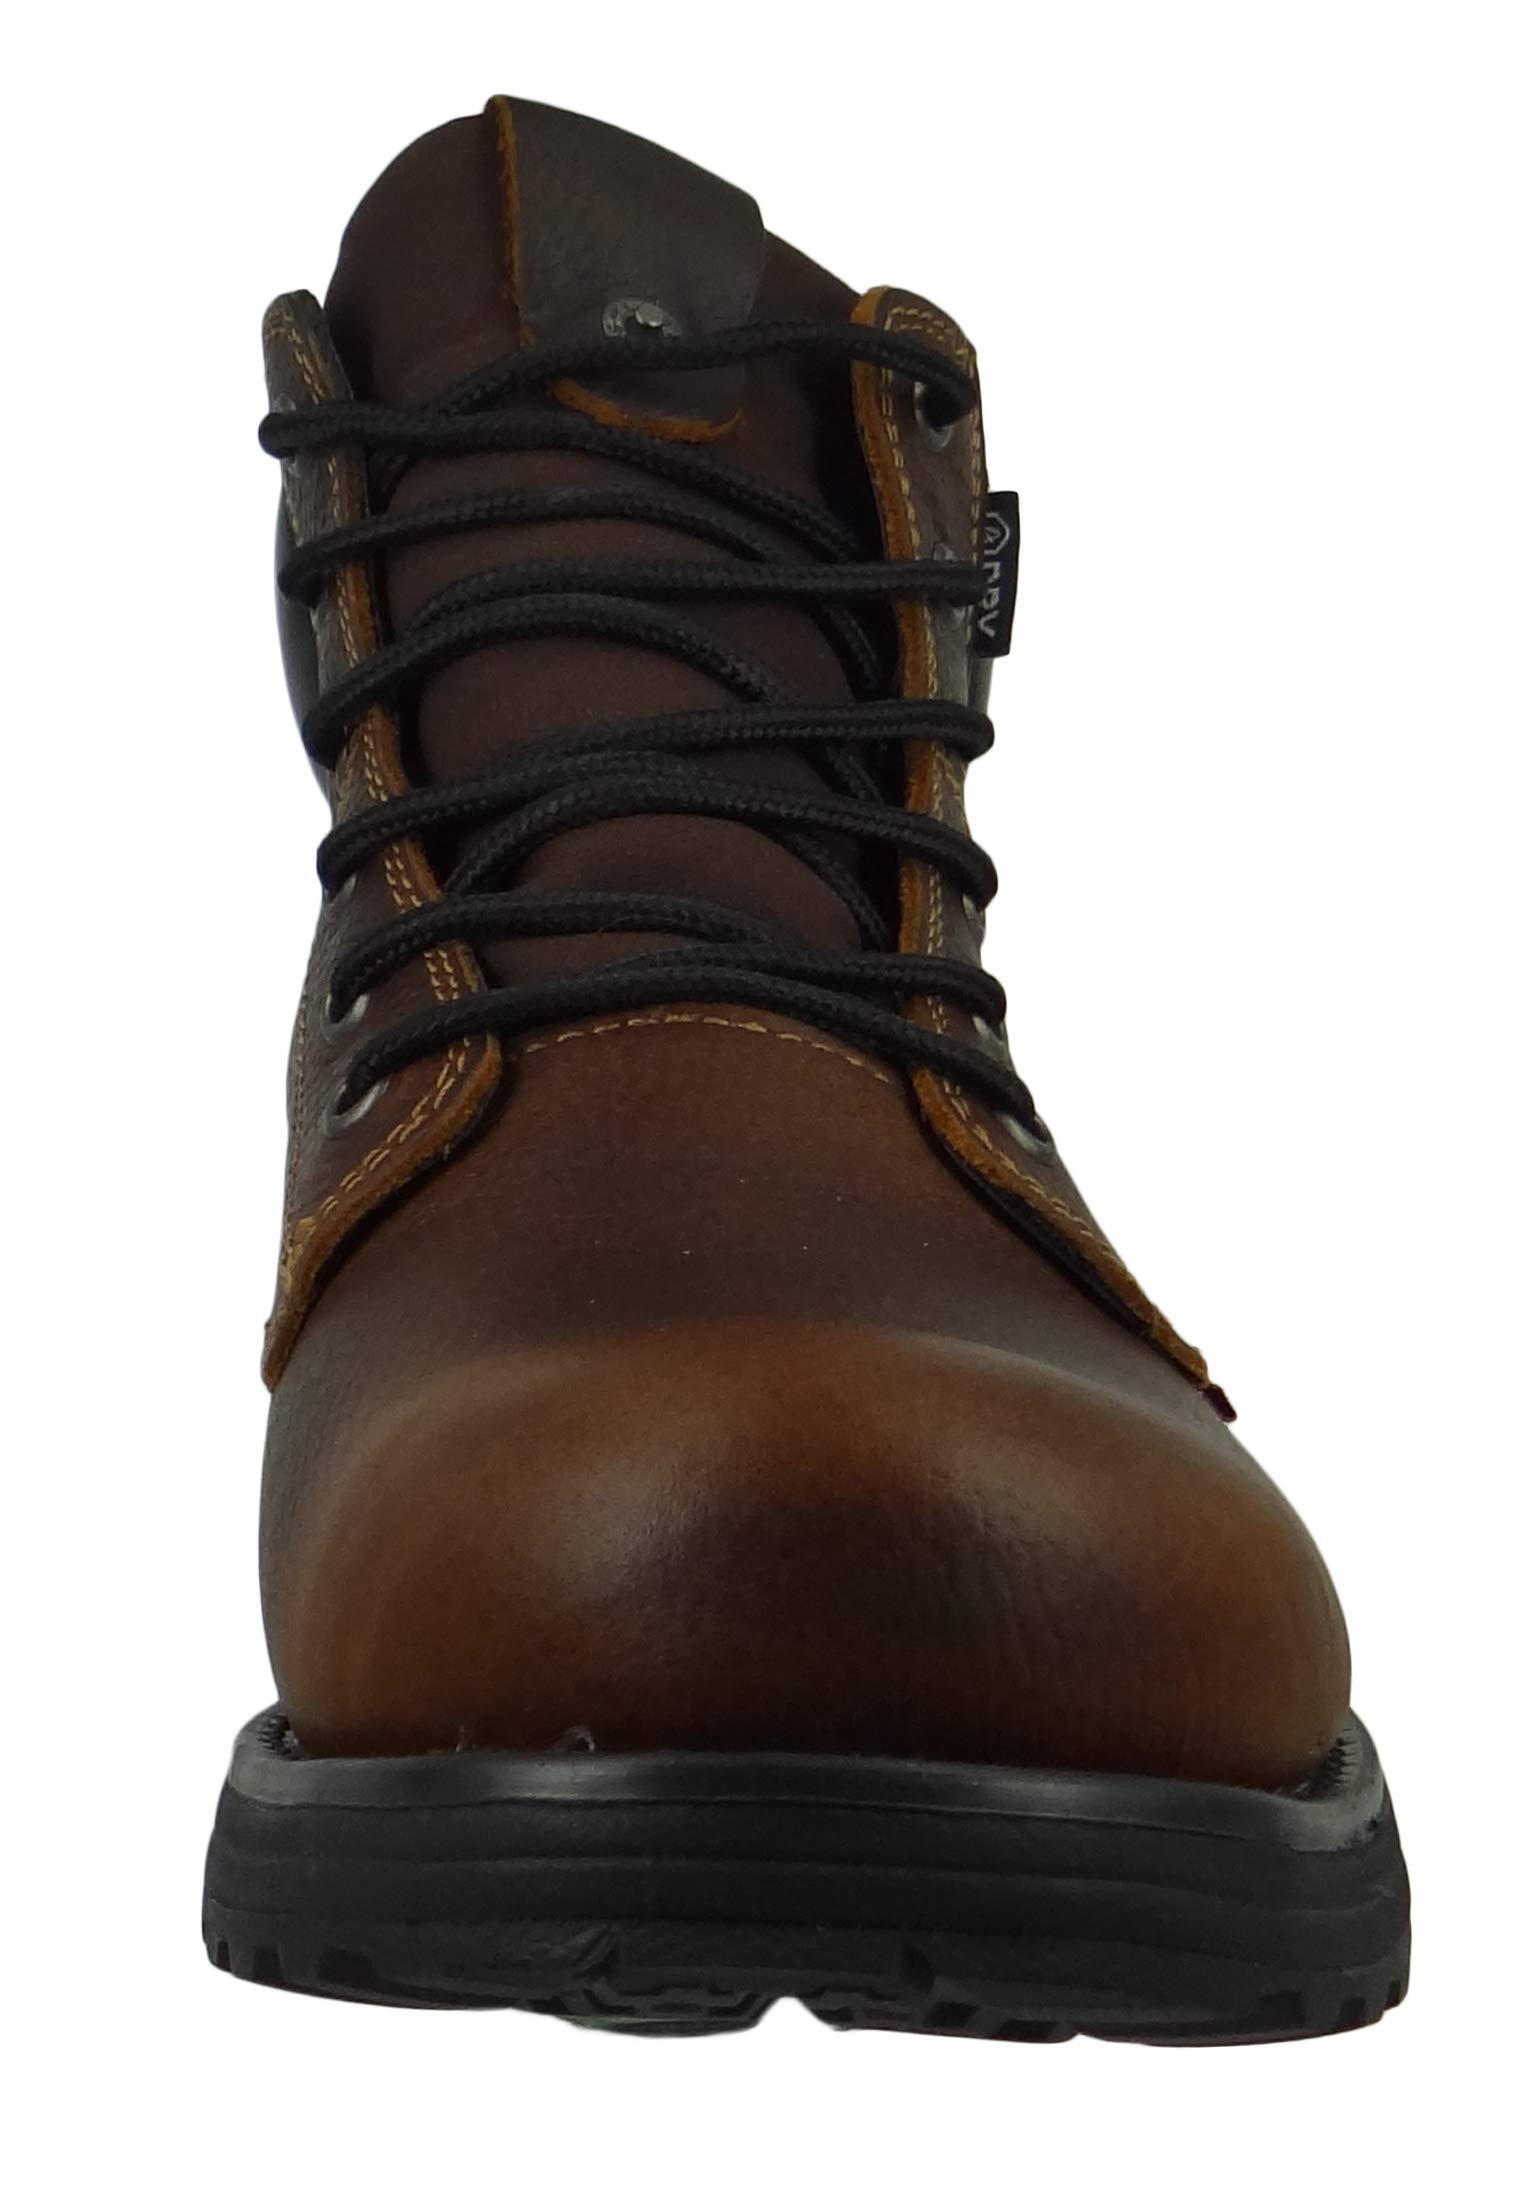 Levi's Arrowhead 228777-829-128 Men's Walking Boots Brown 5